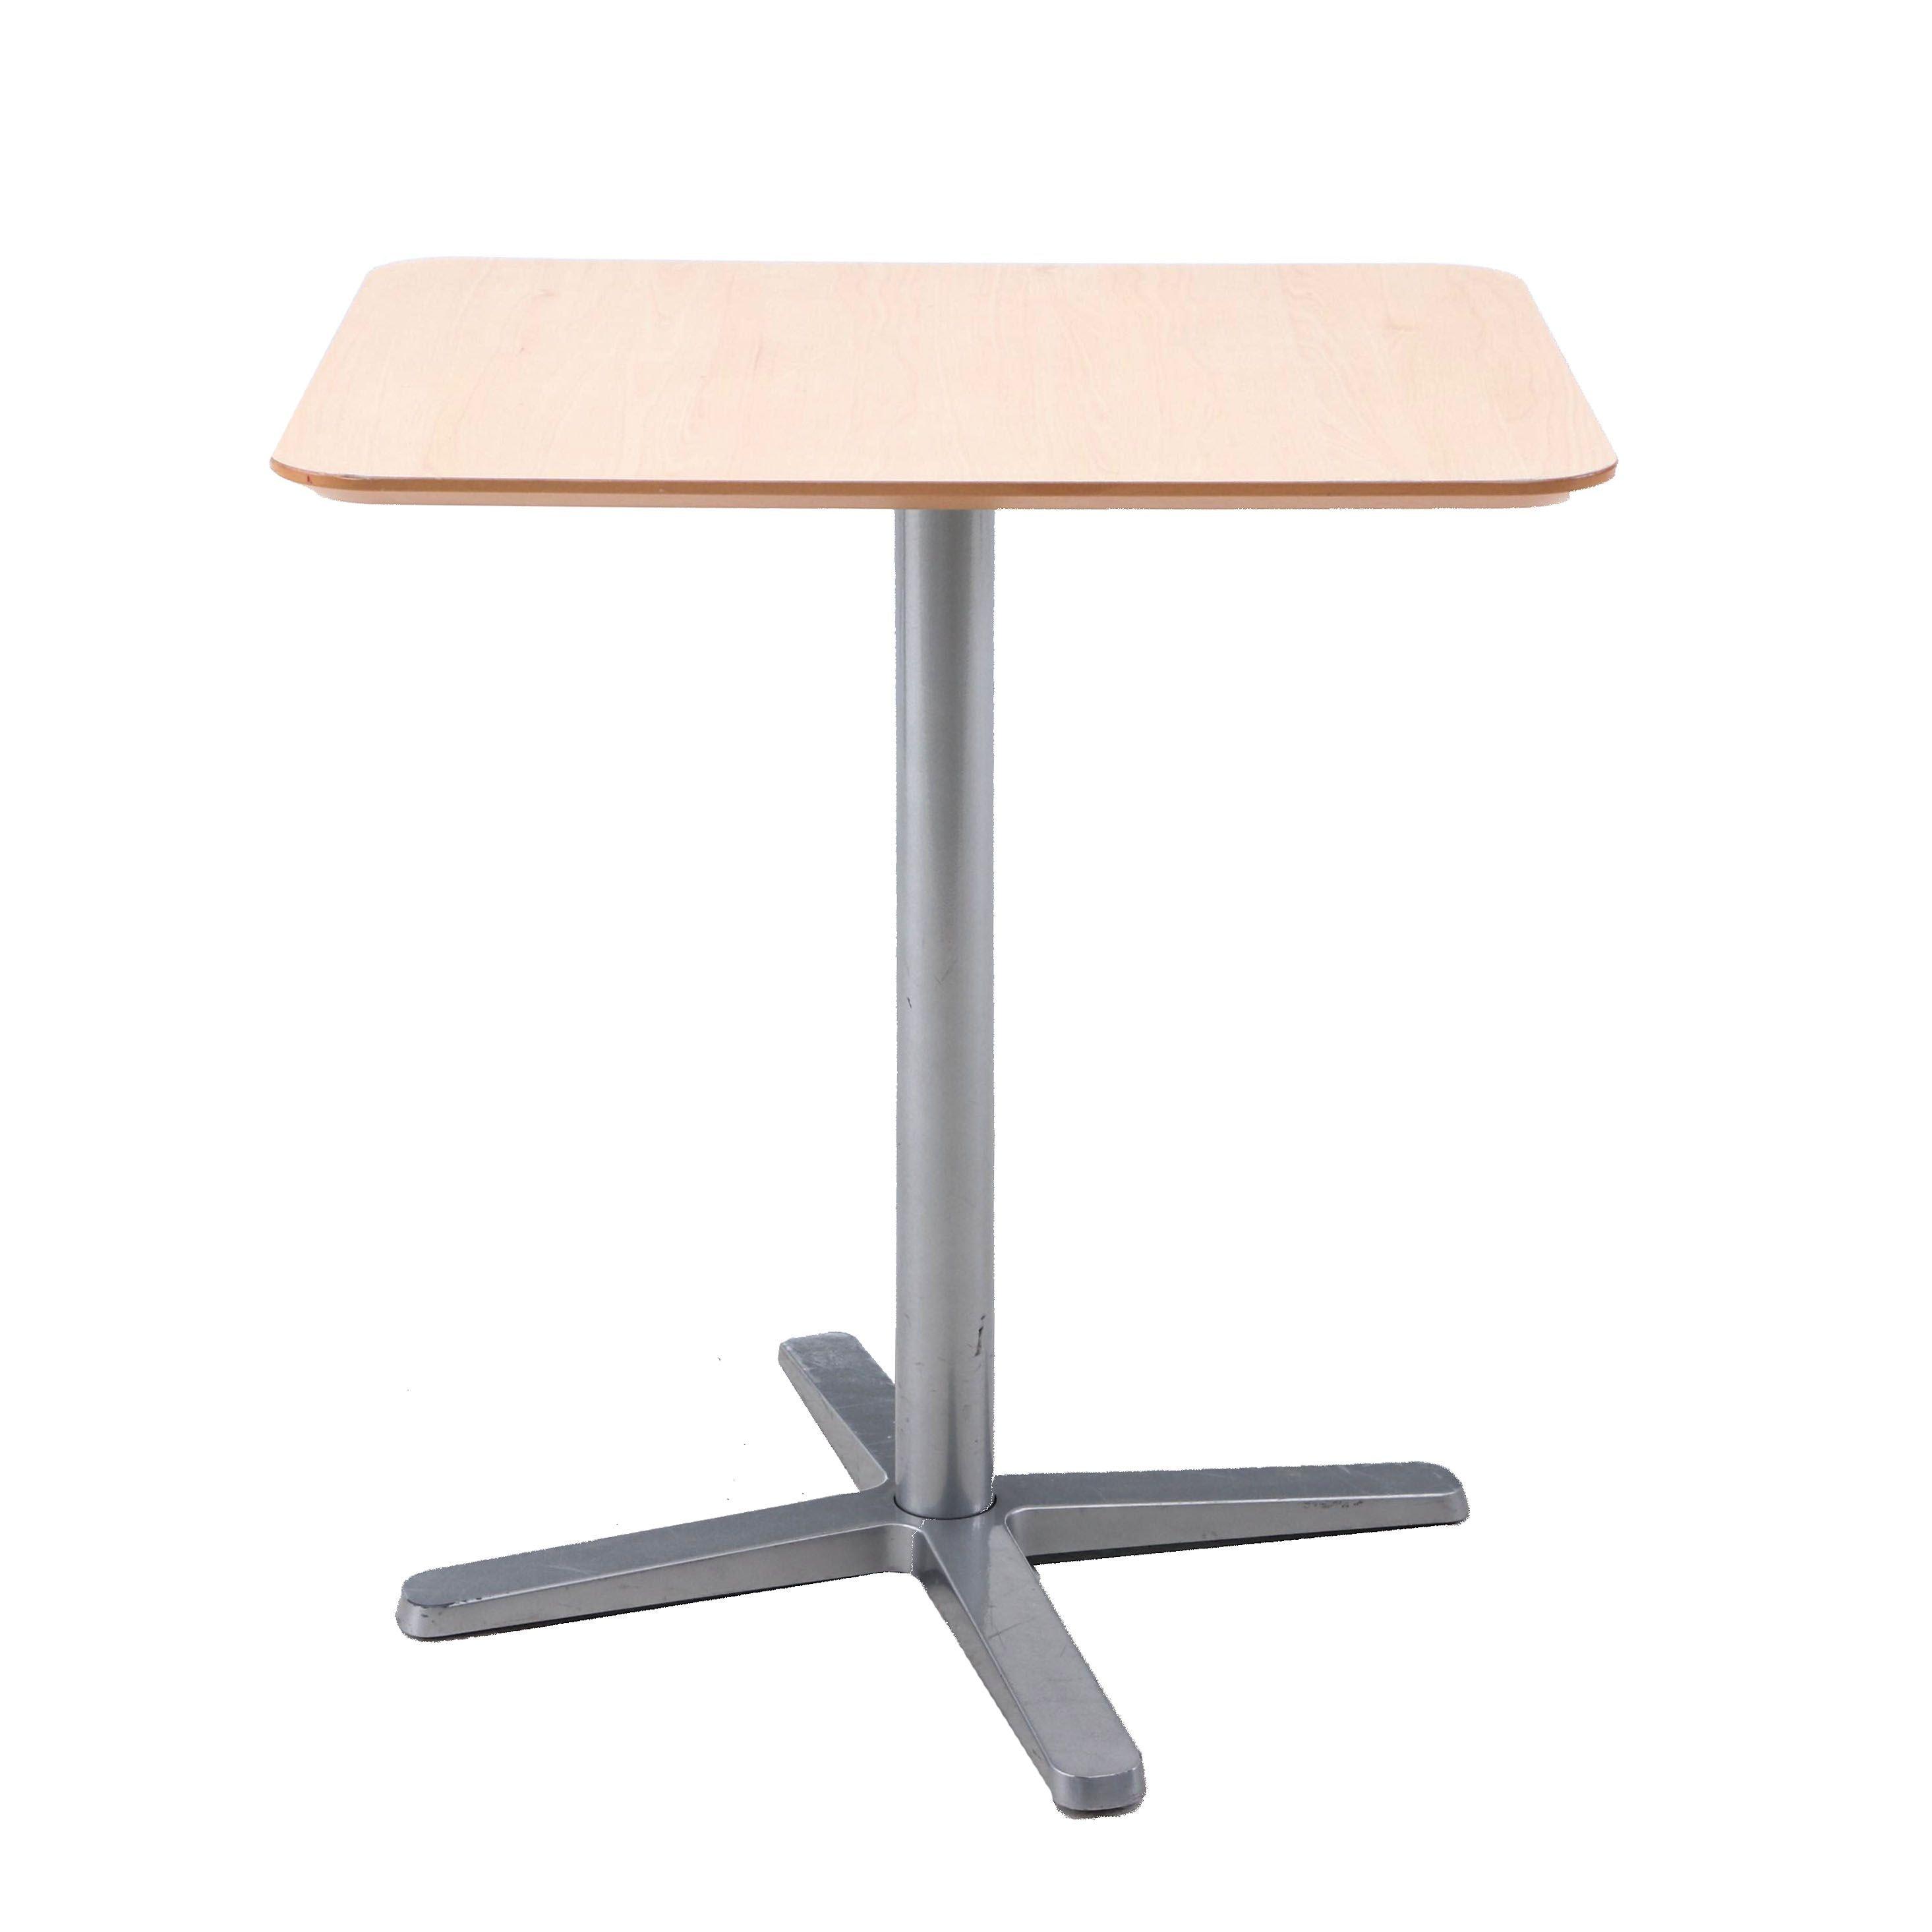 IKEA Billsta Laminate Table with Metal Base